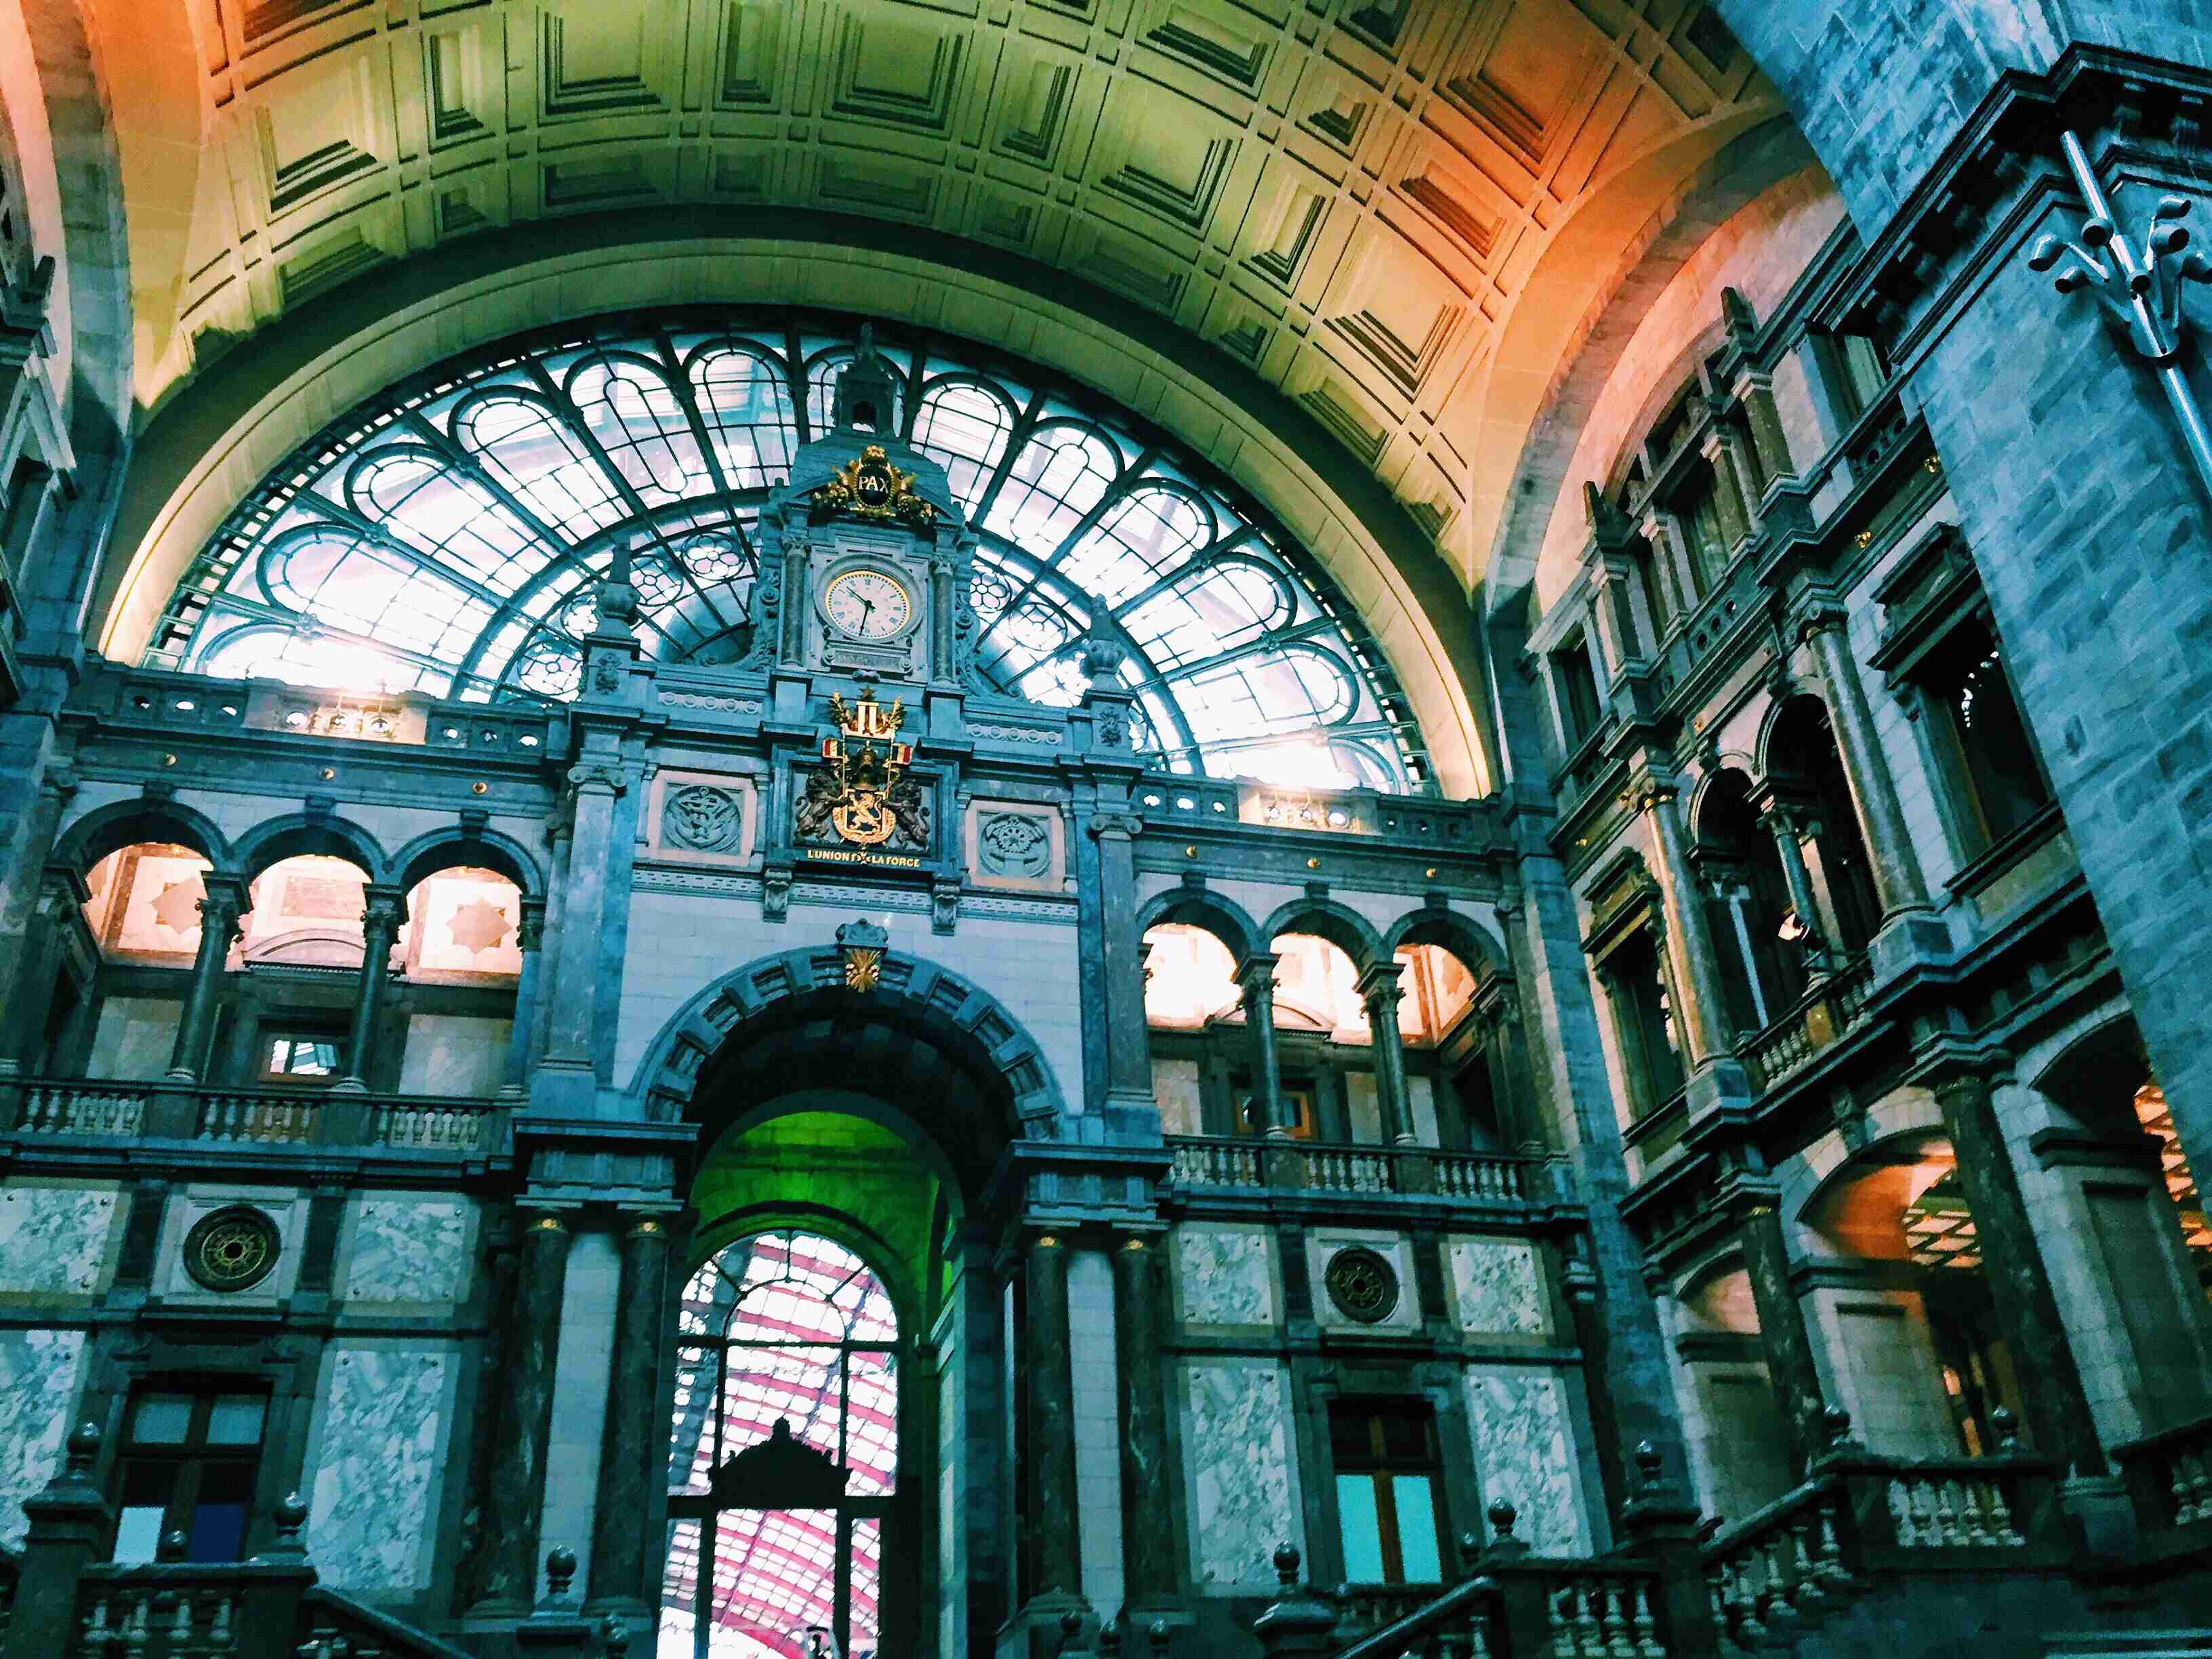 Antwerp Central Train Station. (Photo by @caitsteph /Twenty20)